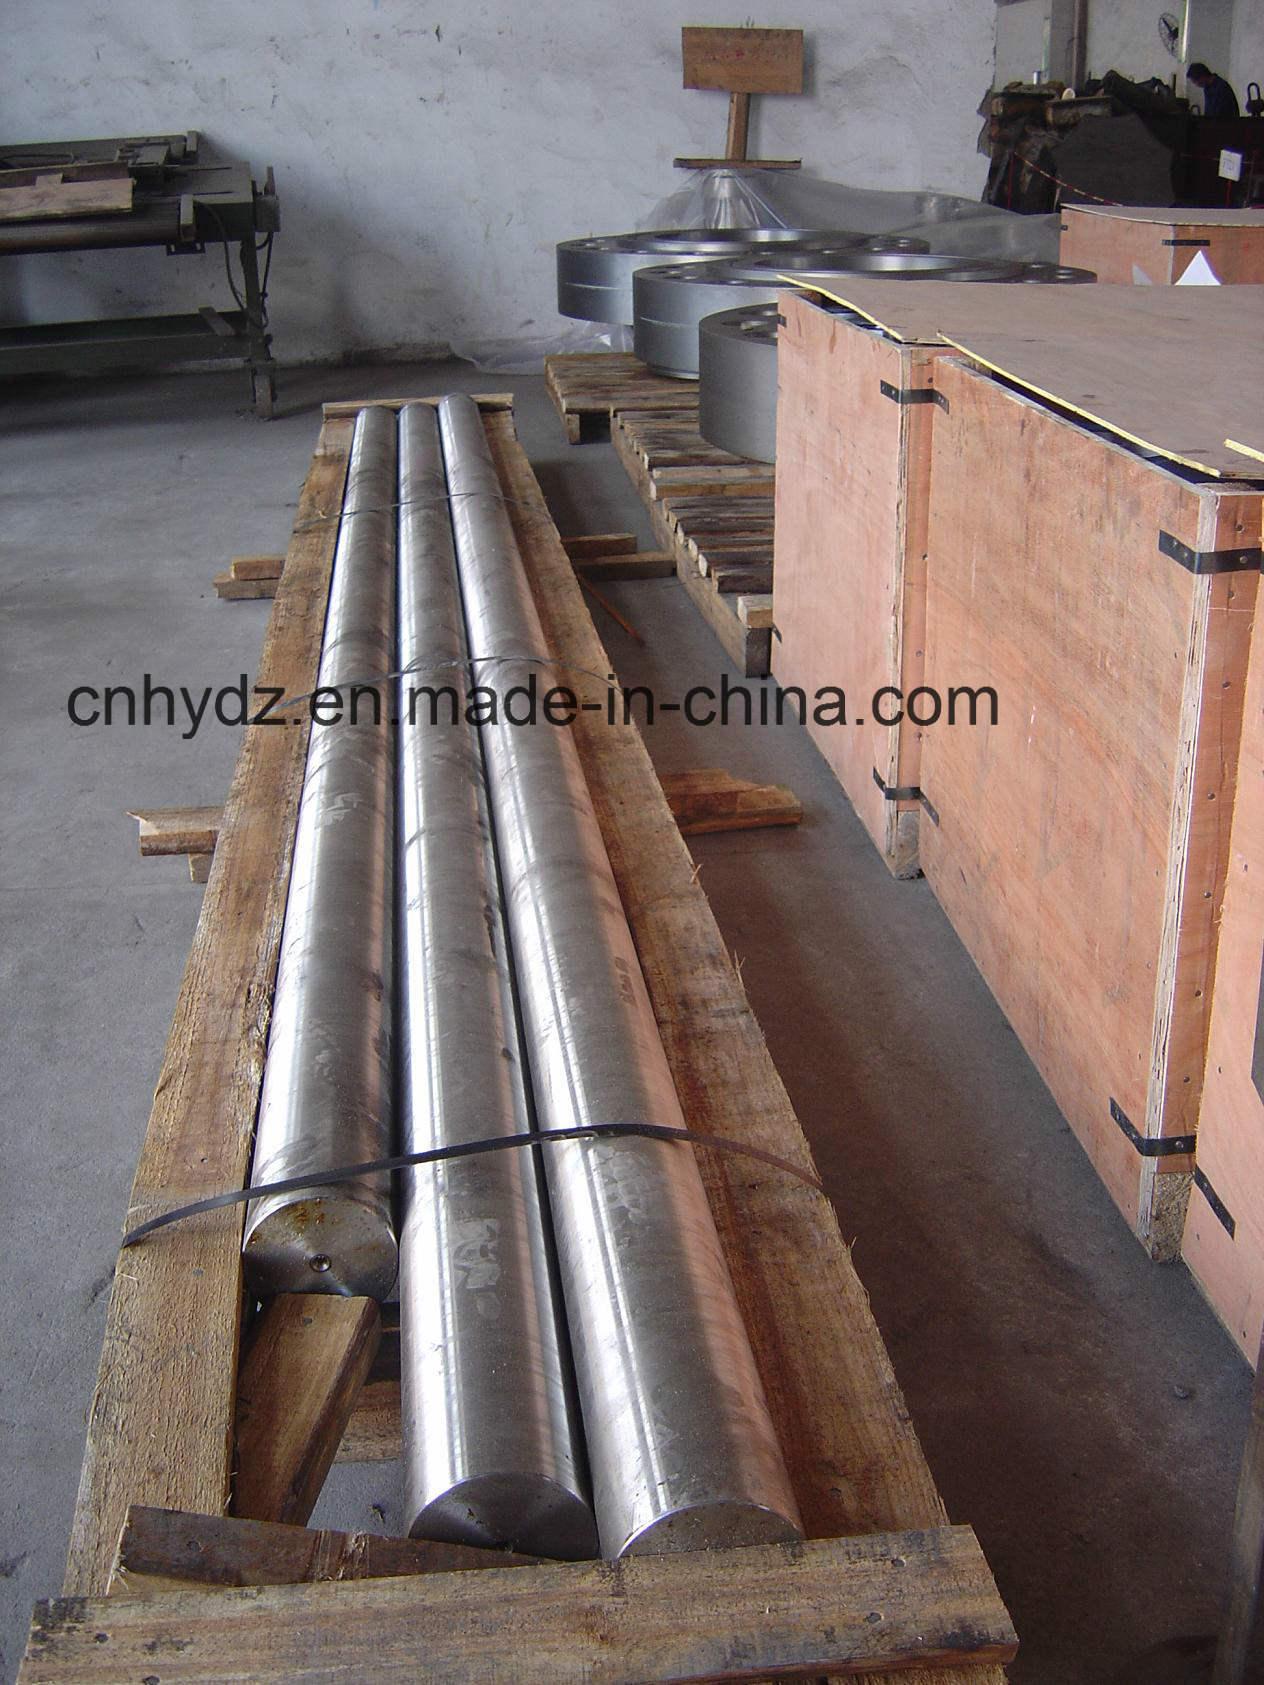 17-4pH (precipitation-hardening stainless steel) Forged Bar